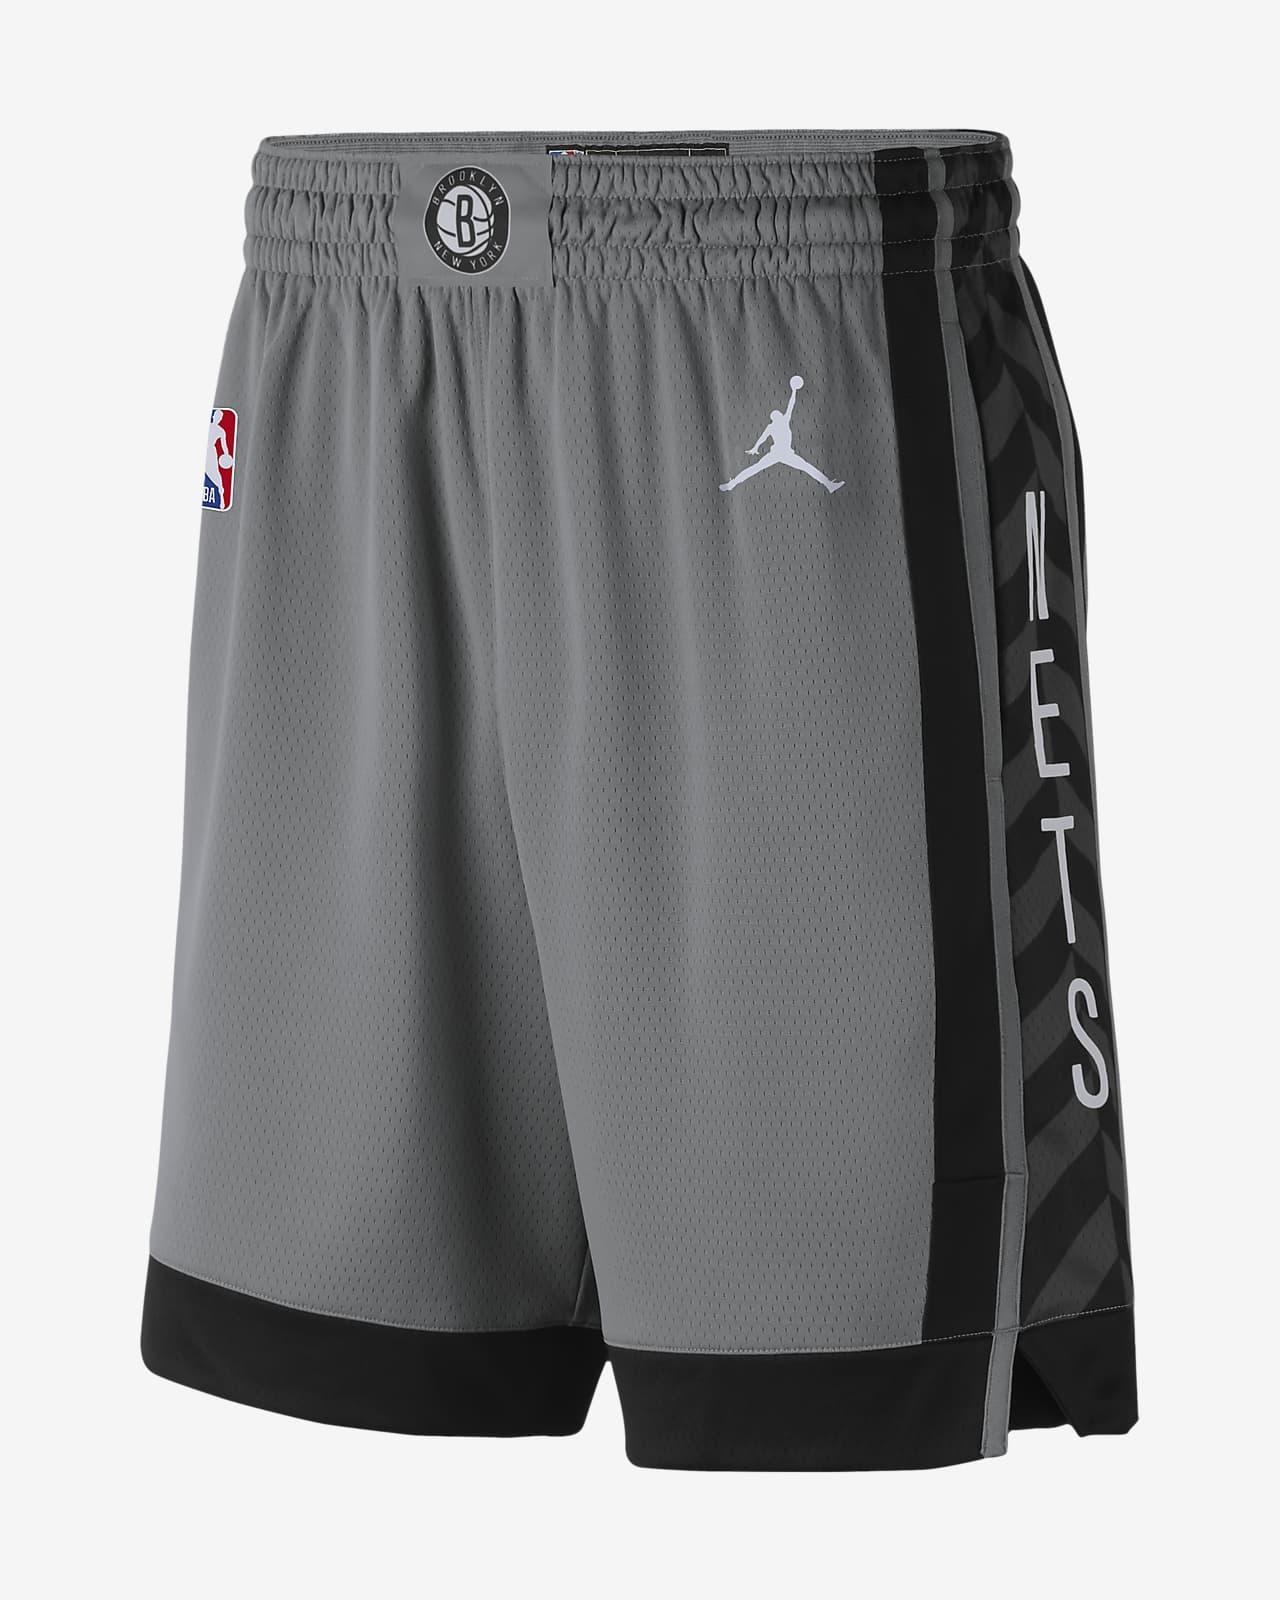 Nets Statement Edition 2020 Men's Jordan NBA Swingman Shorts